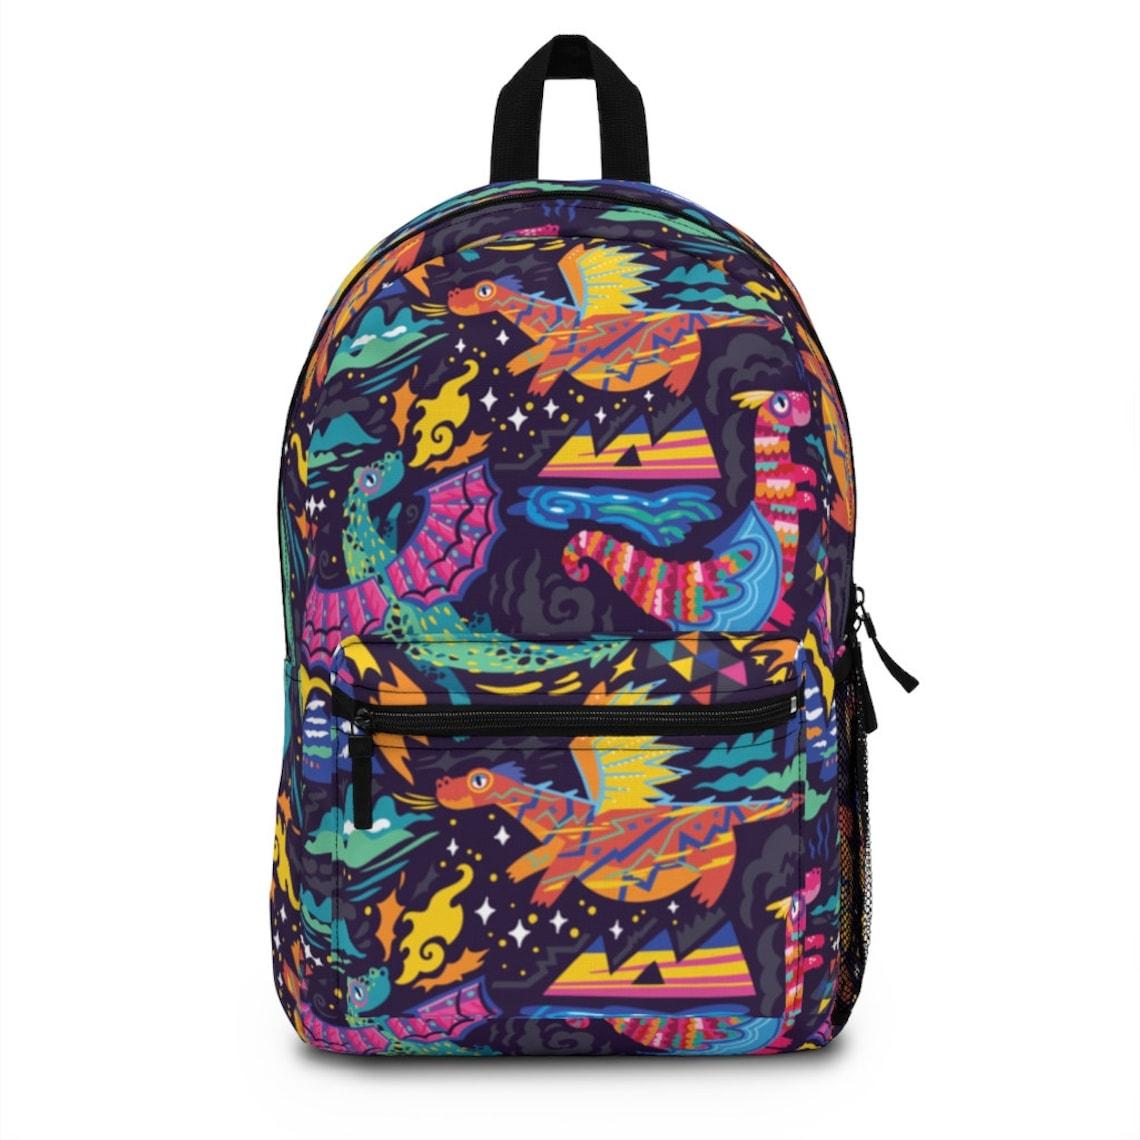 1. Dragon Personalised Backpack